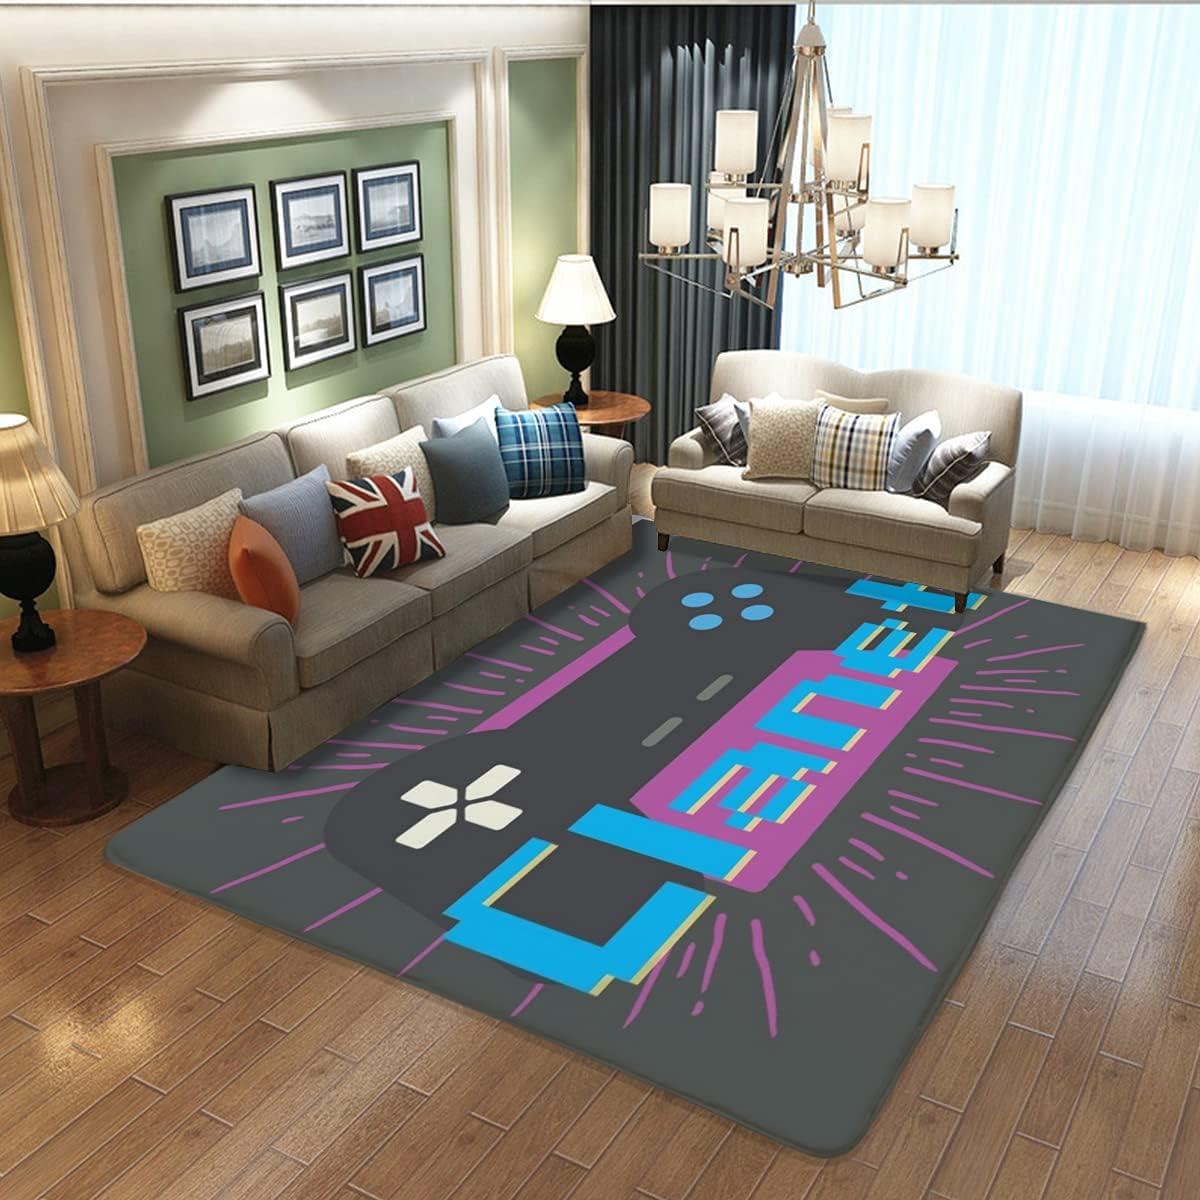 Teen Boys Carpets Printed Gamepad Bedroom Gamer Max 48% OFF Room Mat low-pricing Living